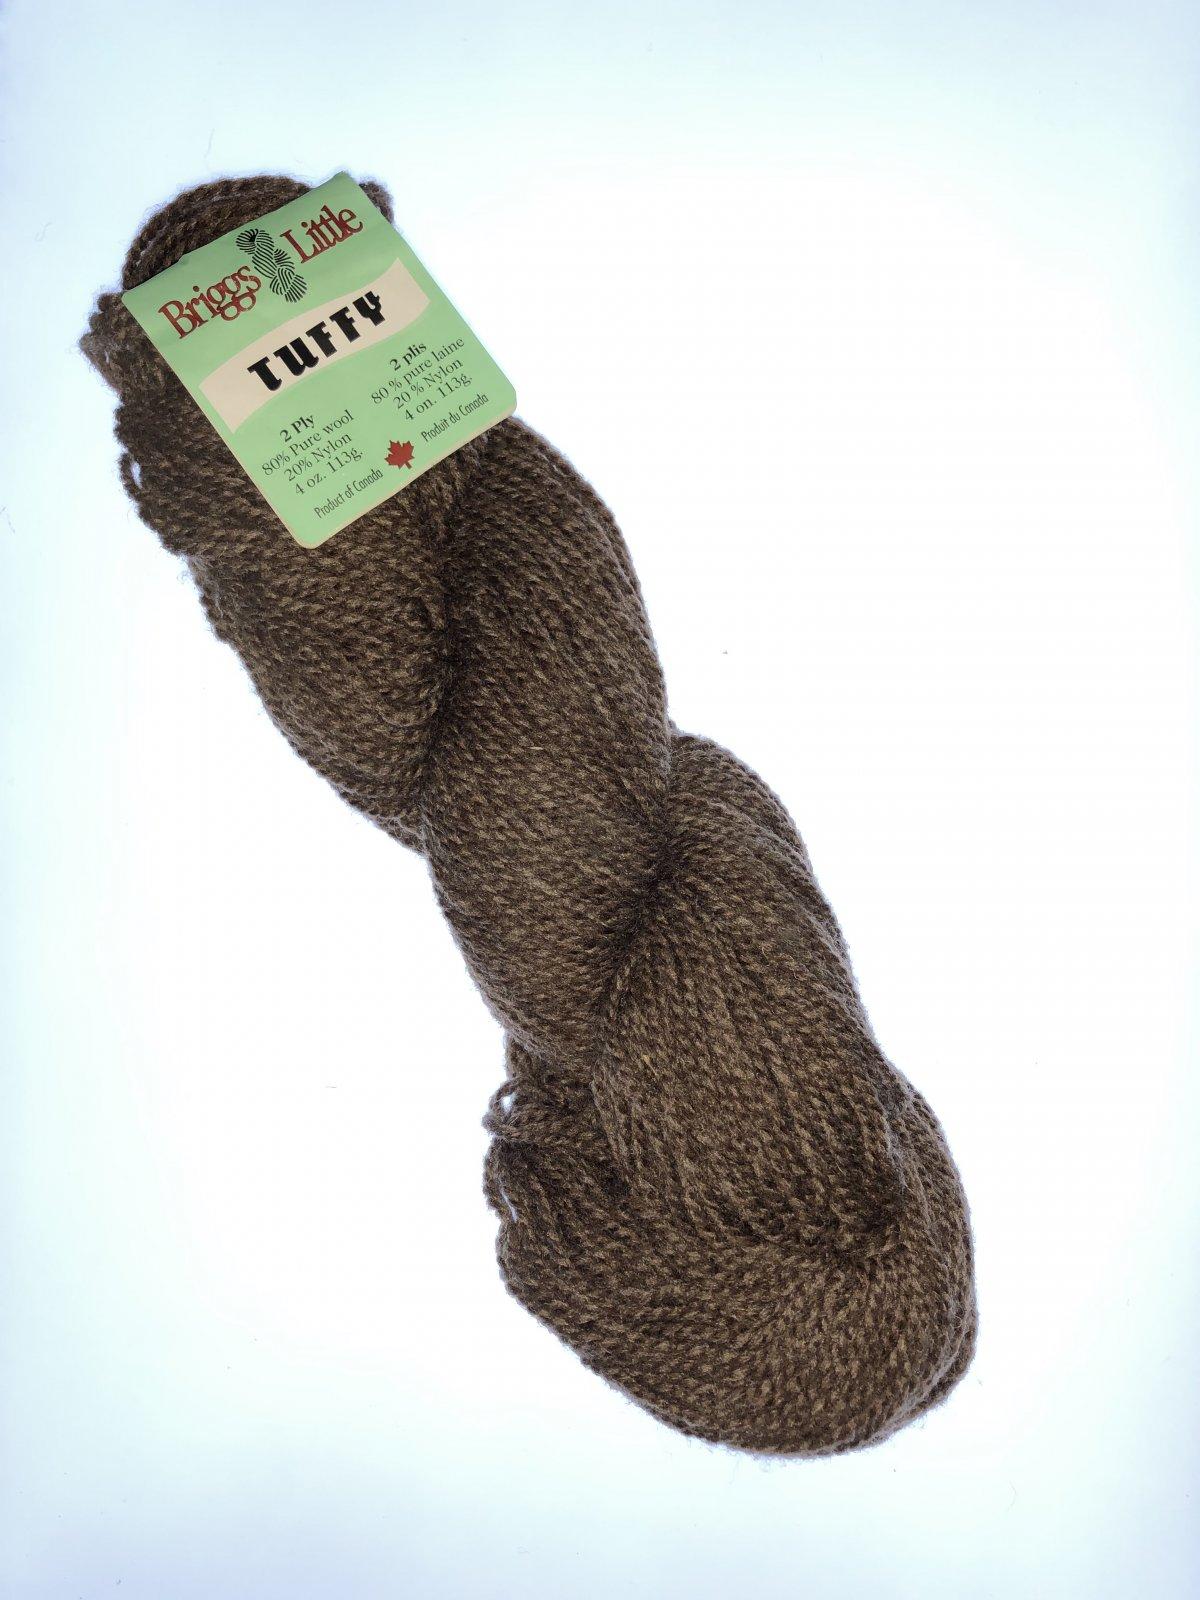 Tuffy 2 Ply 4oz (113g) 80% Wool 20% Nylon Worsted/Aran Yarn Cocoa